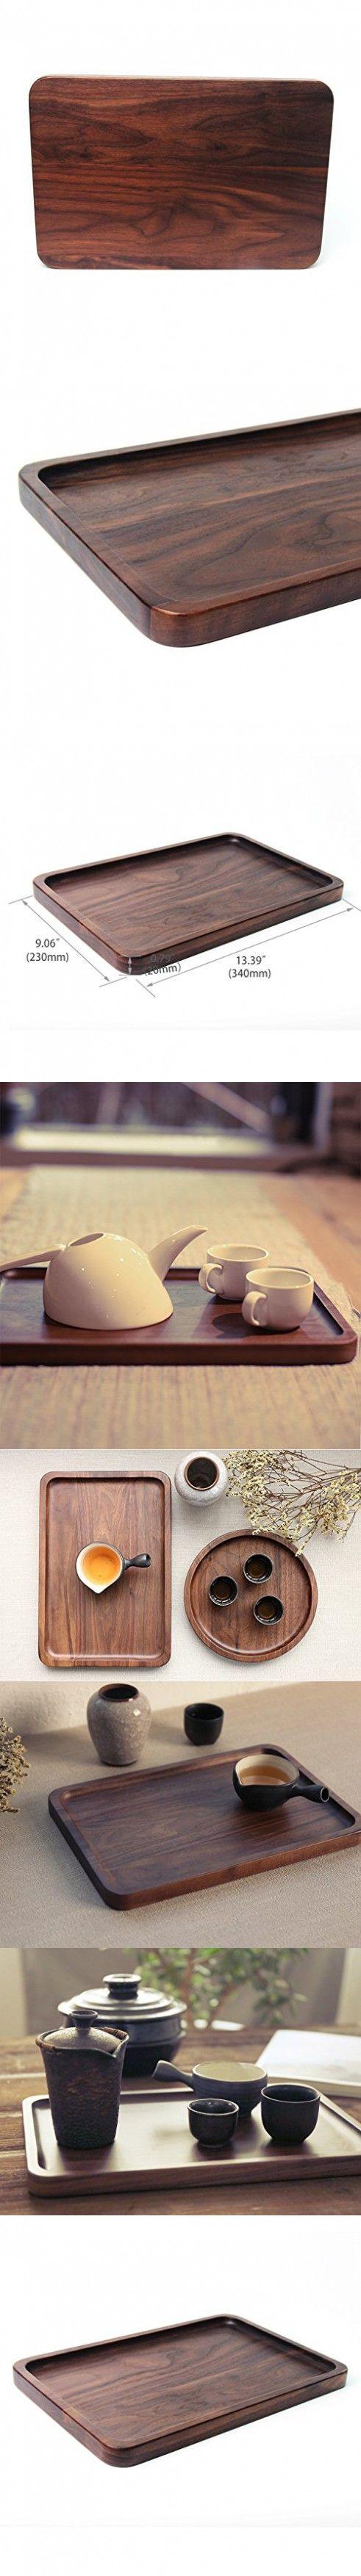 Black Decorative Tray Delectable 428 Best Decorative Trays Images On Pinterest  Decorative Trays Design Ideas